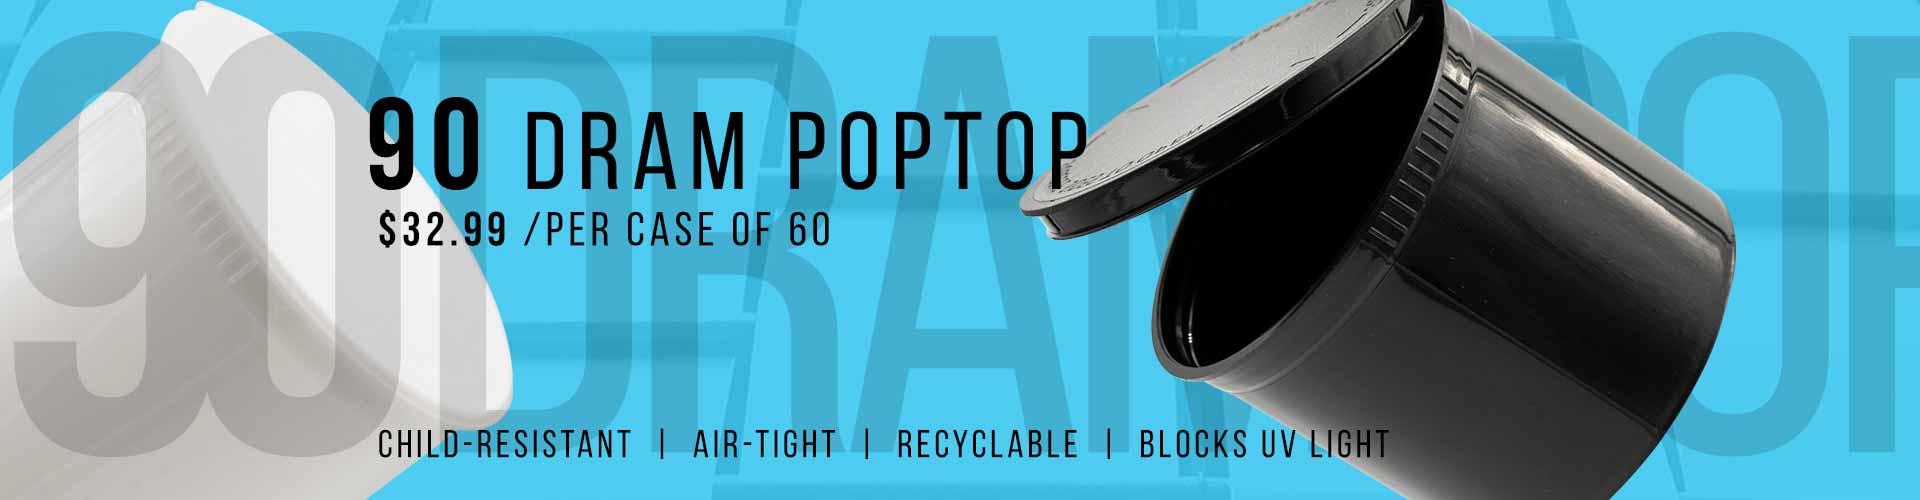 90 dram poptop